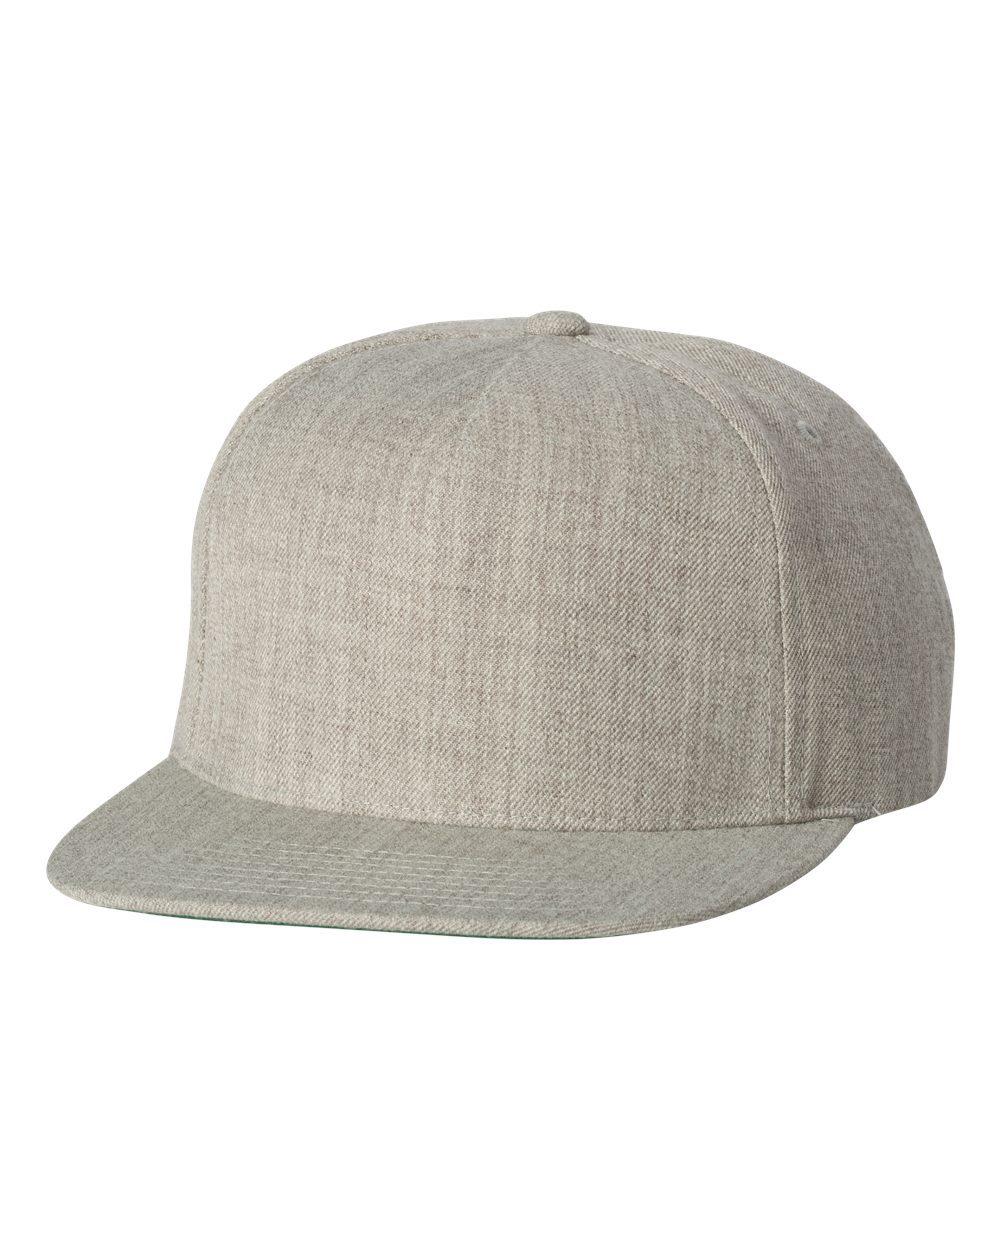 YP Classics 5089M - Wool Blend Snapback Cap